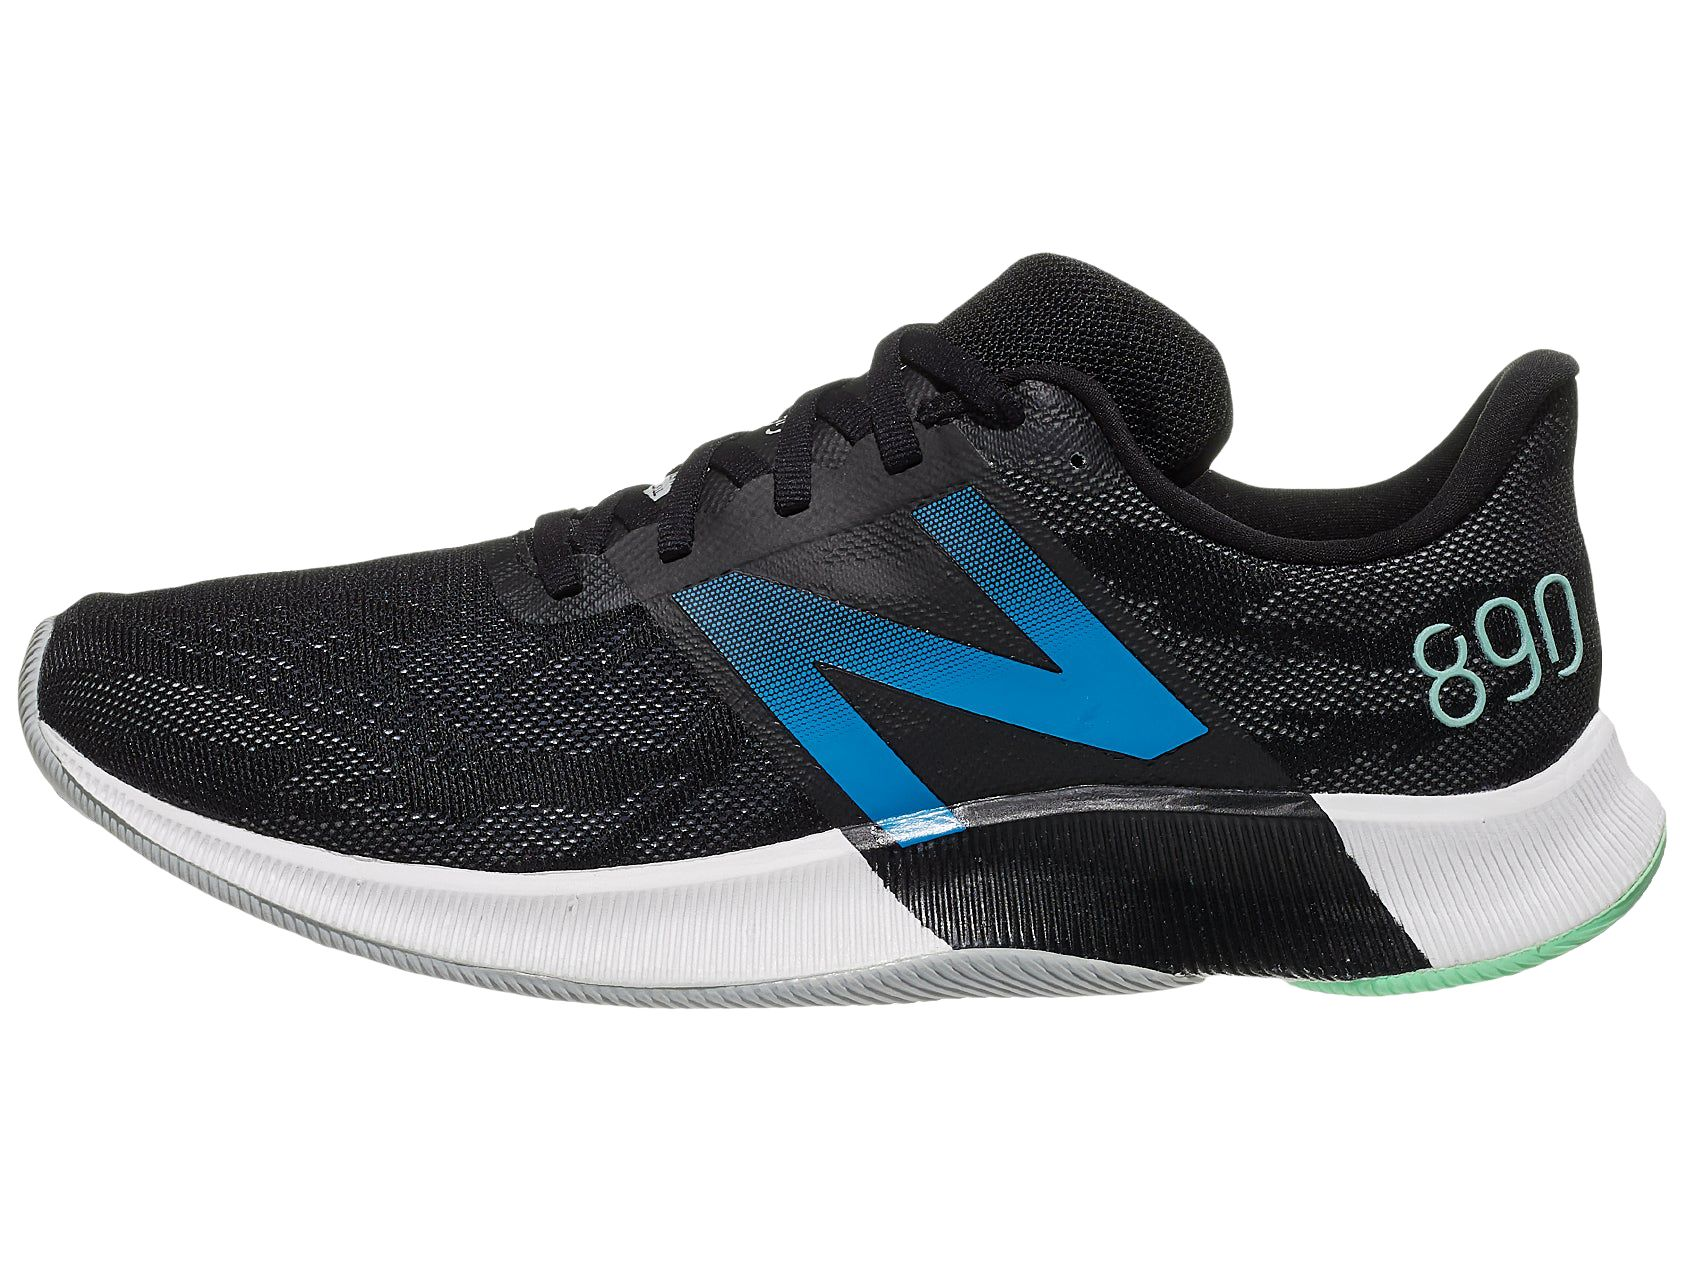 New Balance 890 v8 Review   Running Shoes Guru